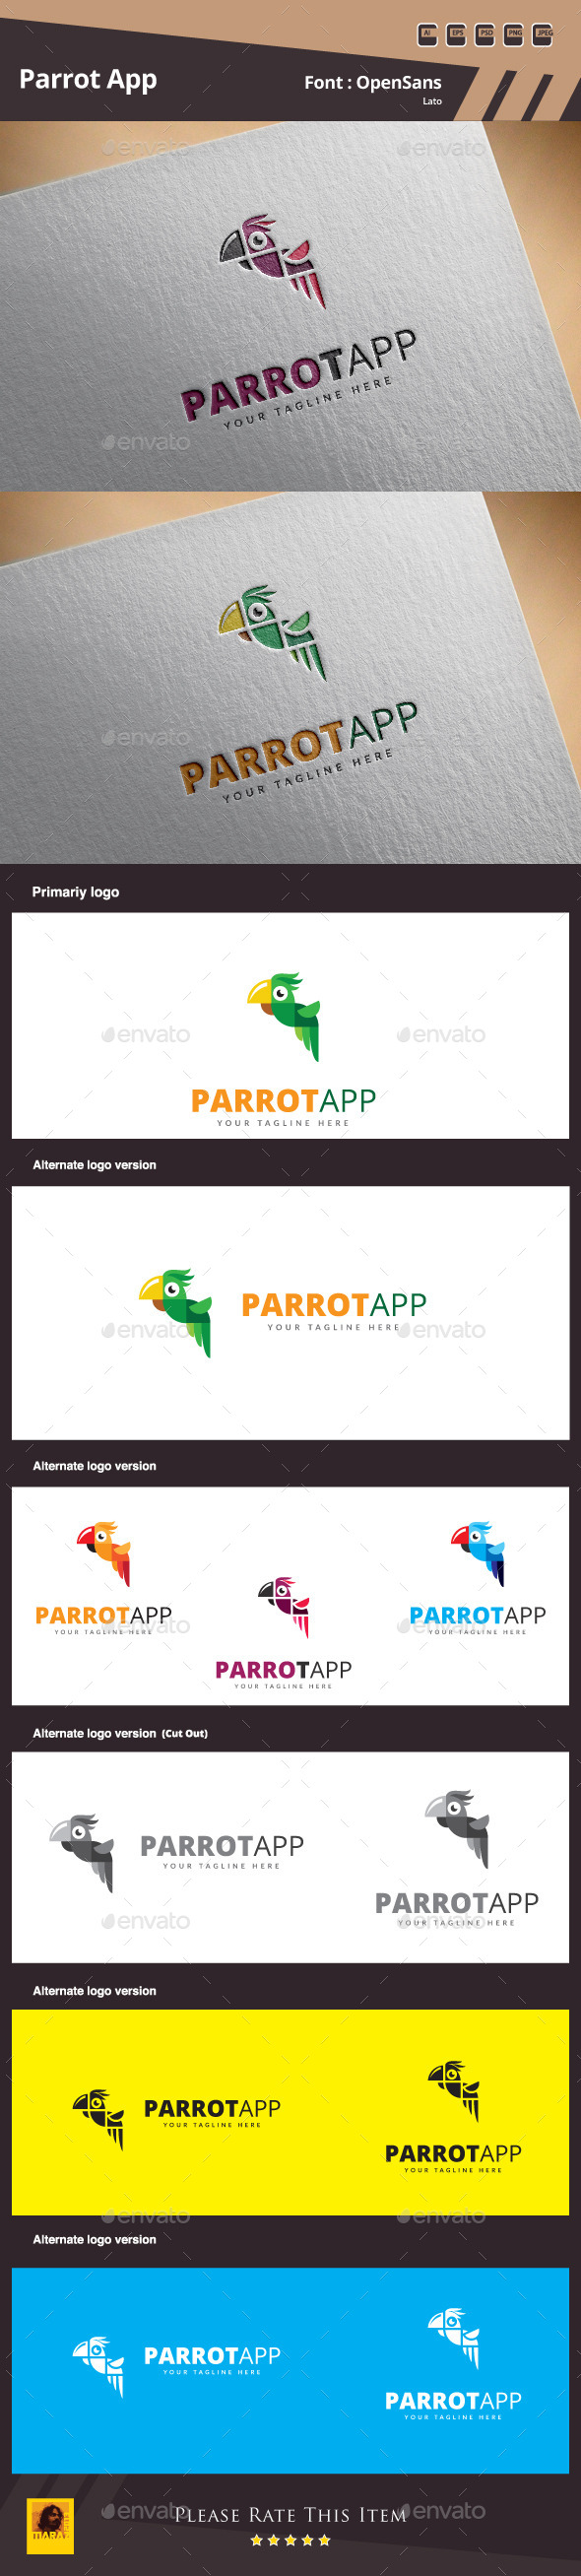 GraphicRiver Parrot App Logo Template 10822939